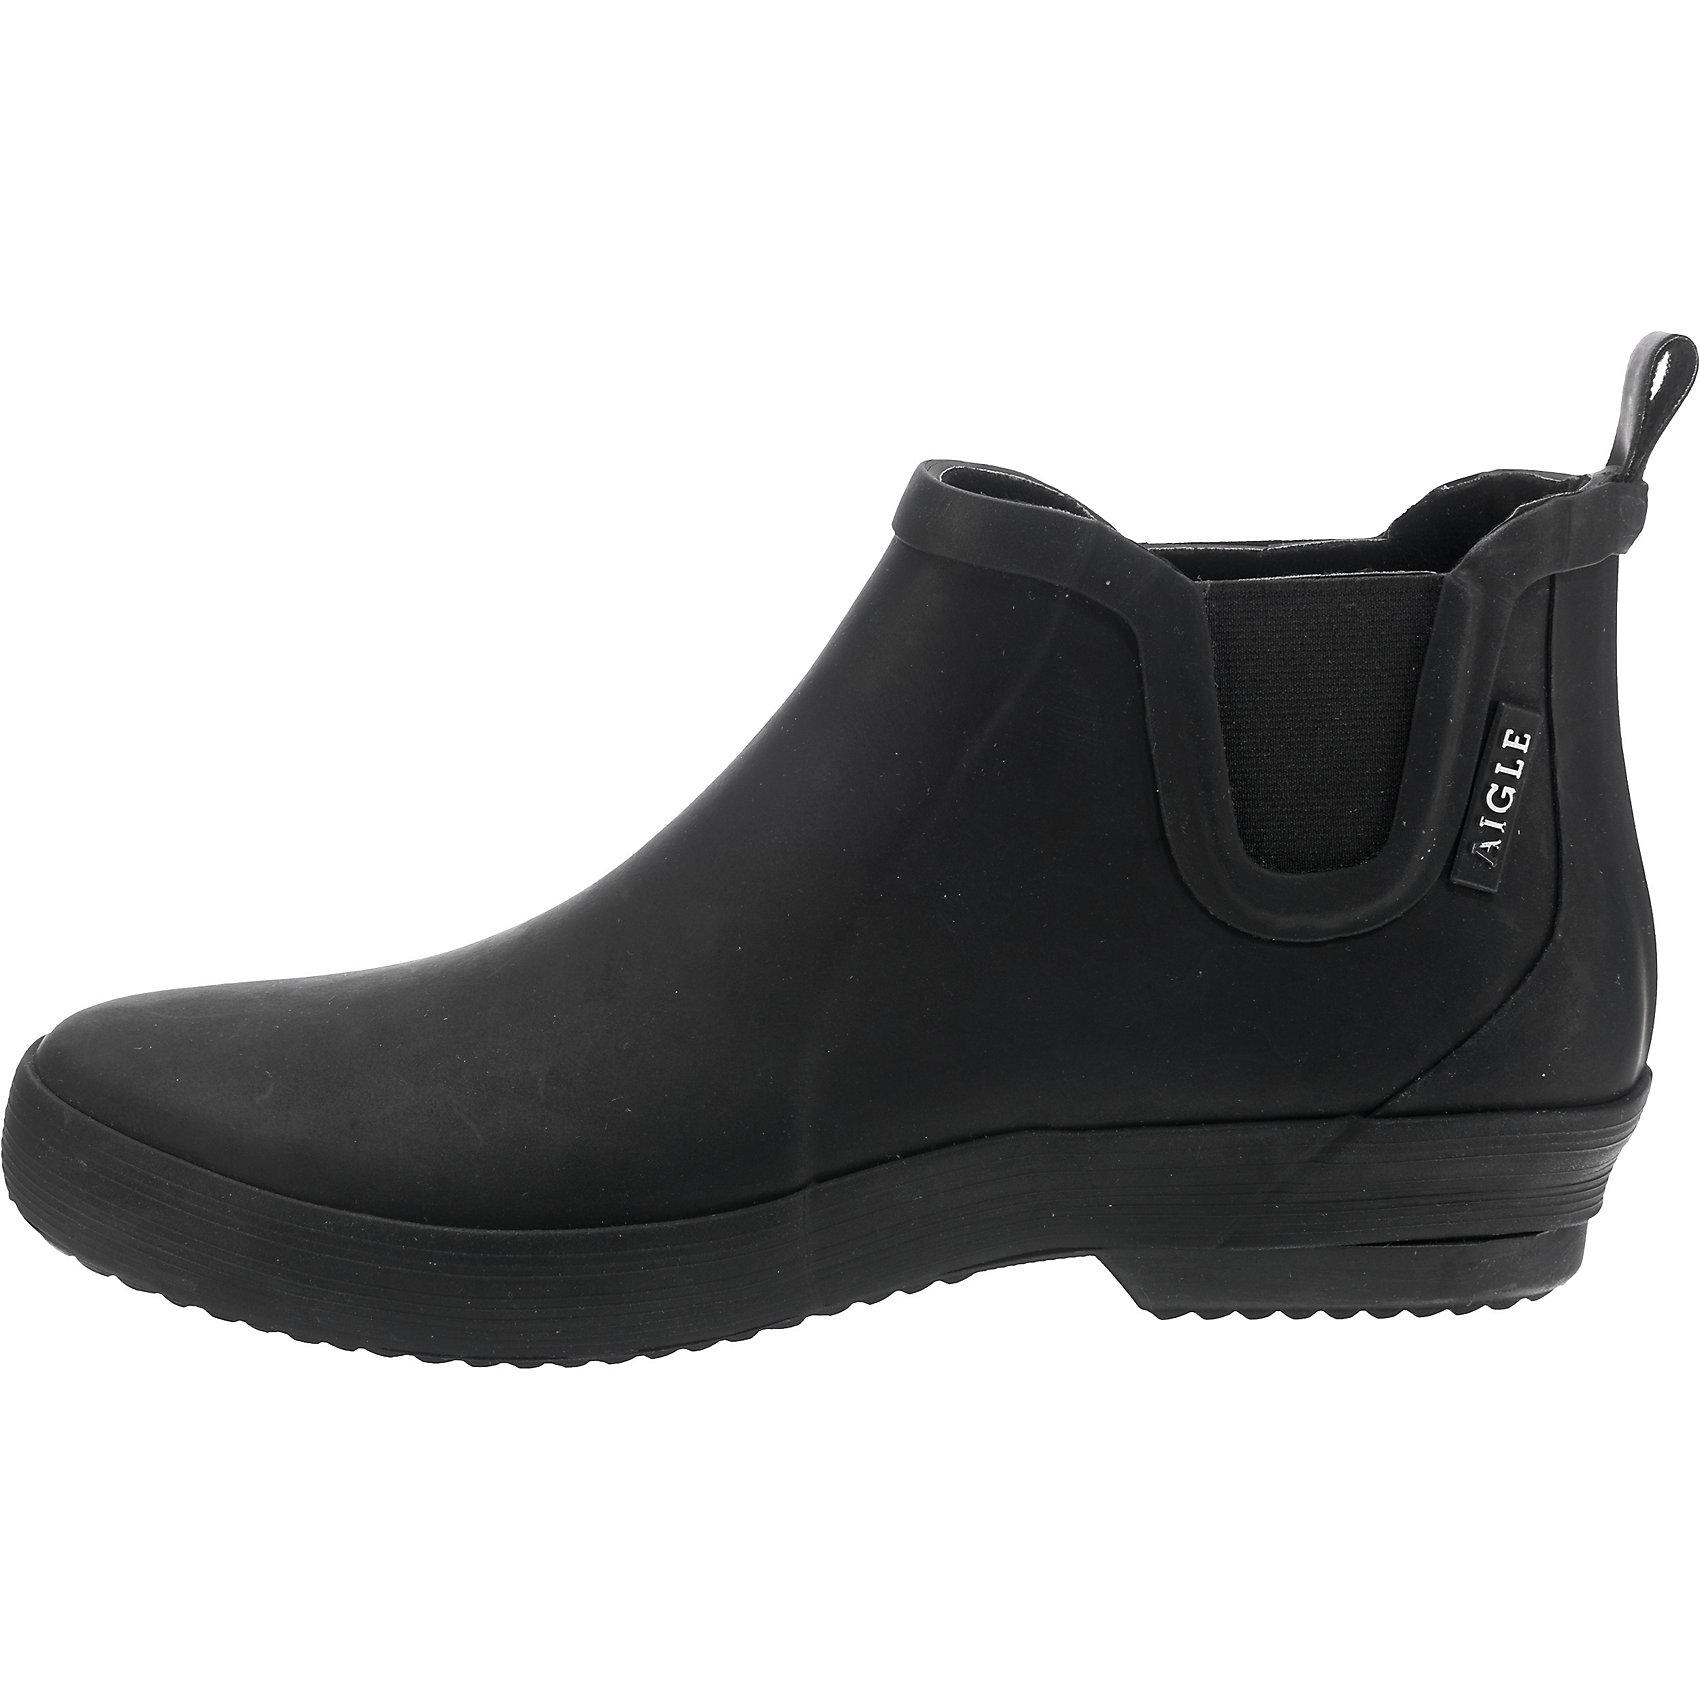 Aigle AIGLE MALOUINE CHELSEA Ankle Boots, schwarz, schwarz